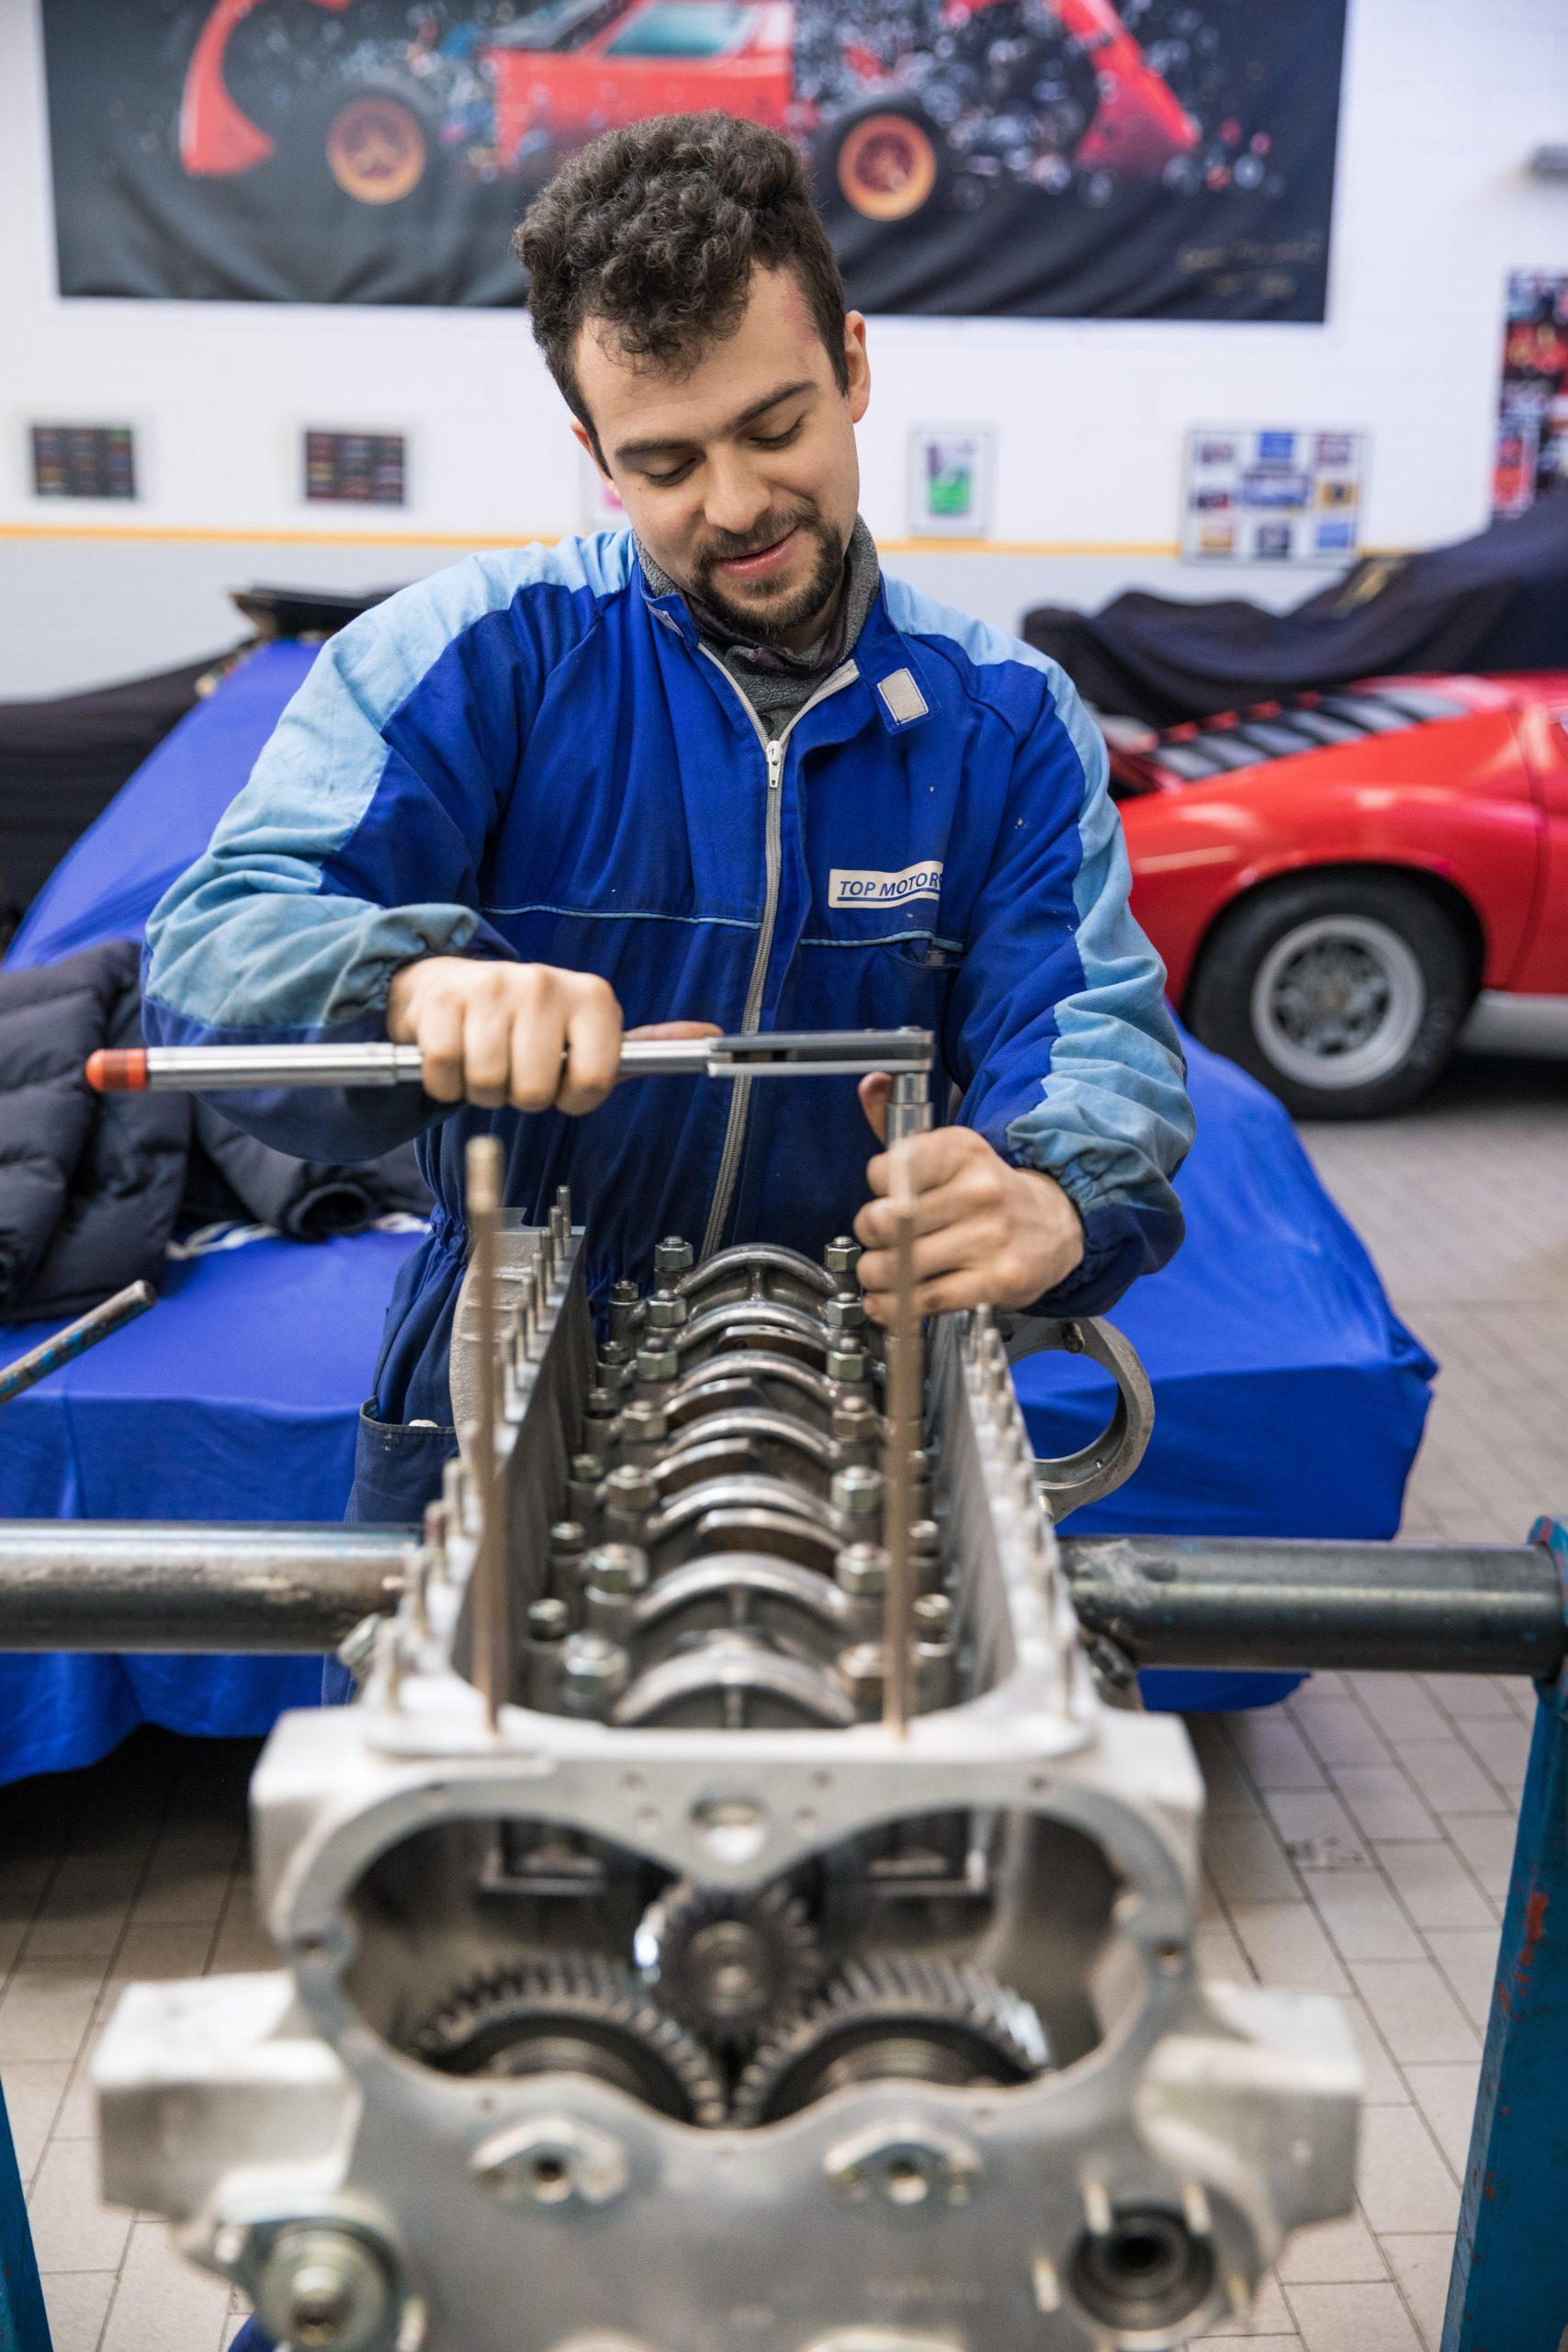 man torques engine nut